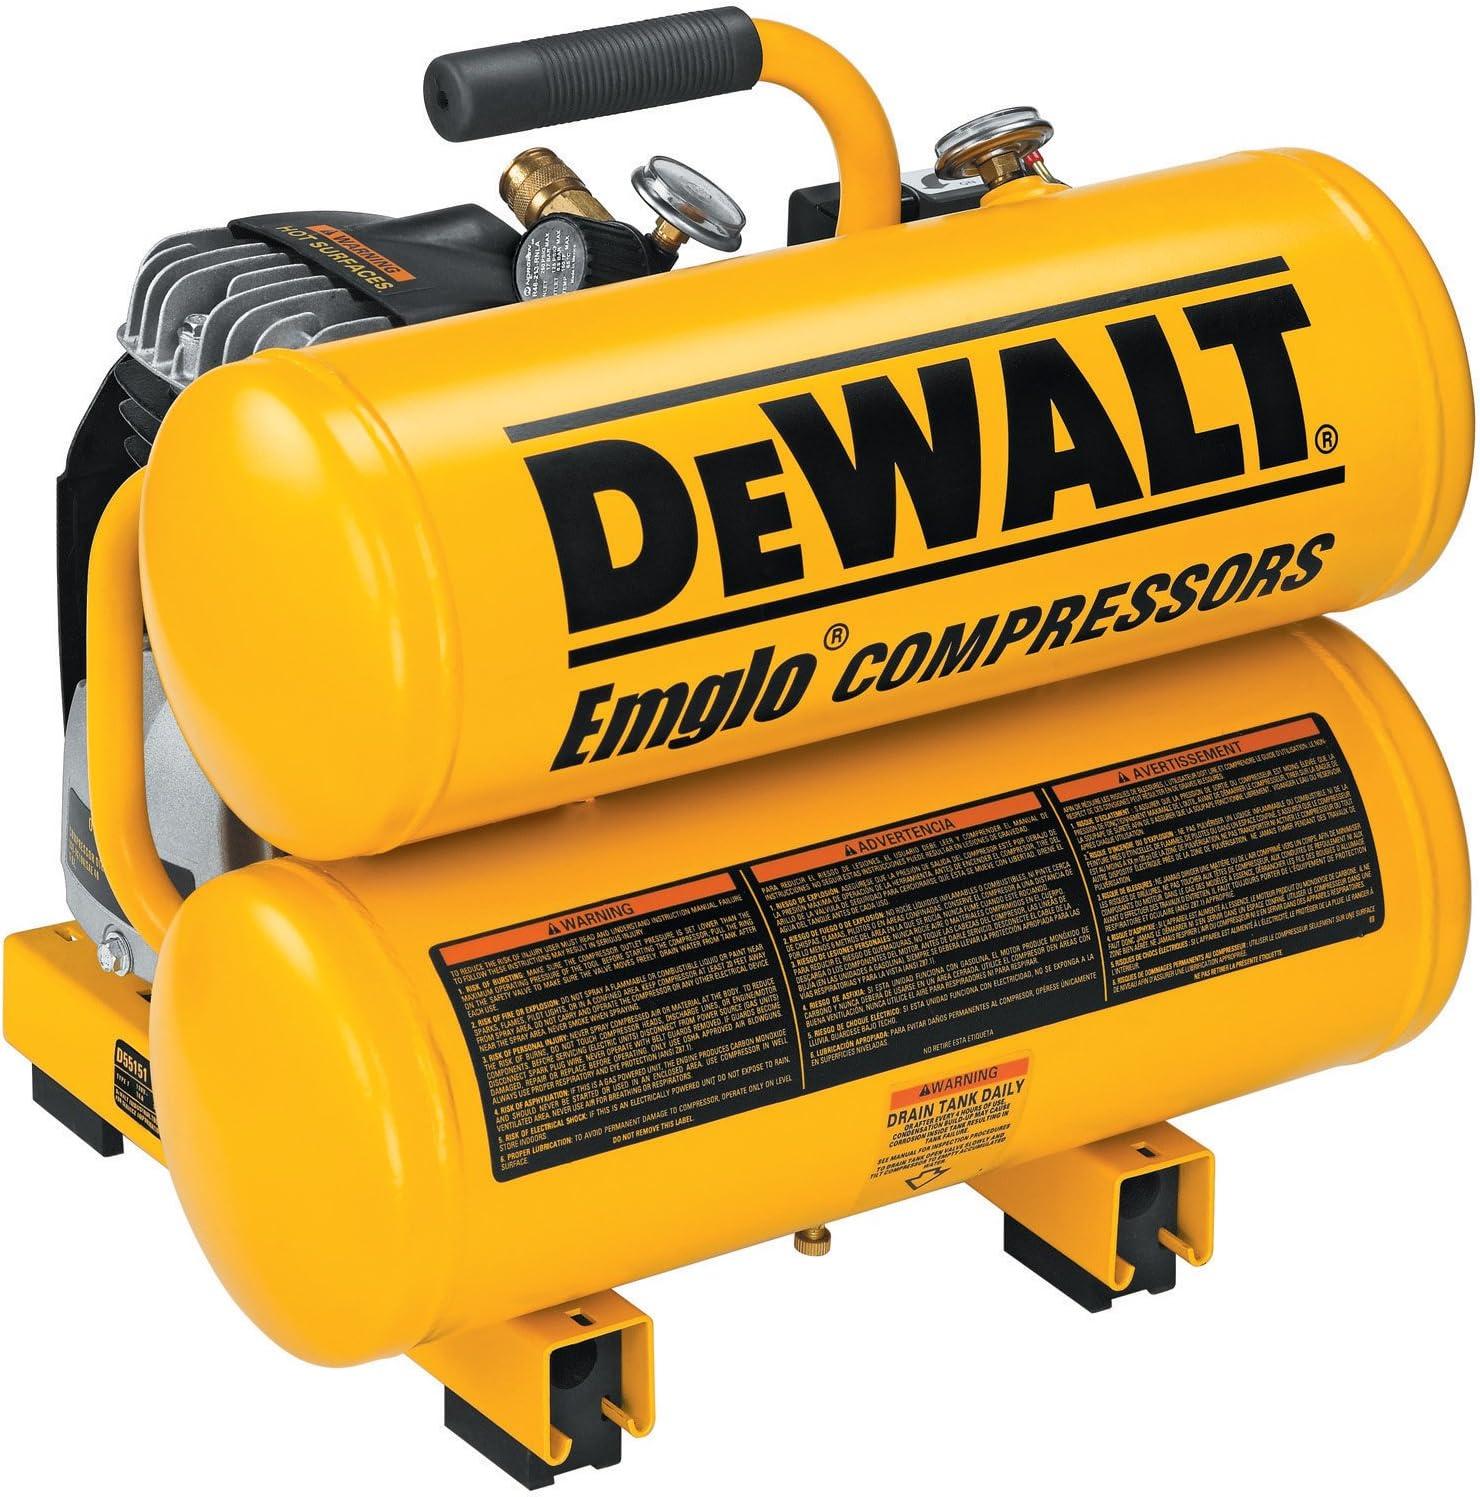 DEWALT D55151 14 Amp 1.1-HP Oiled Twin Hot Dog Compressor